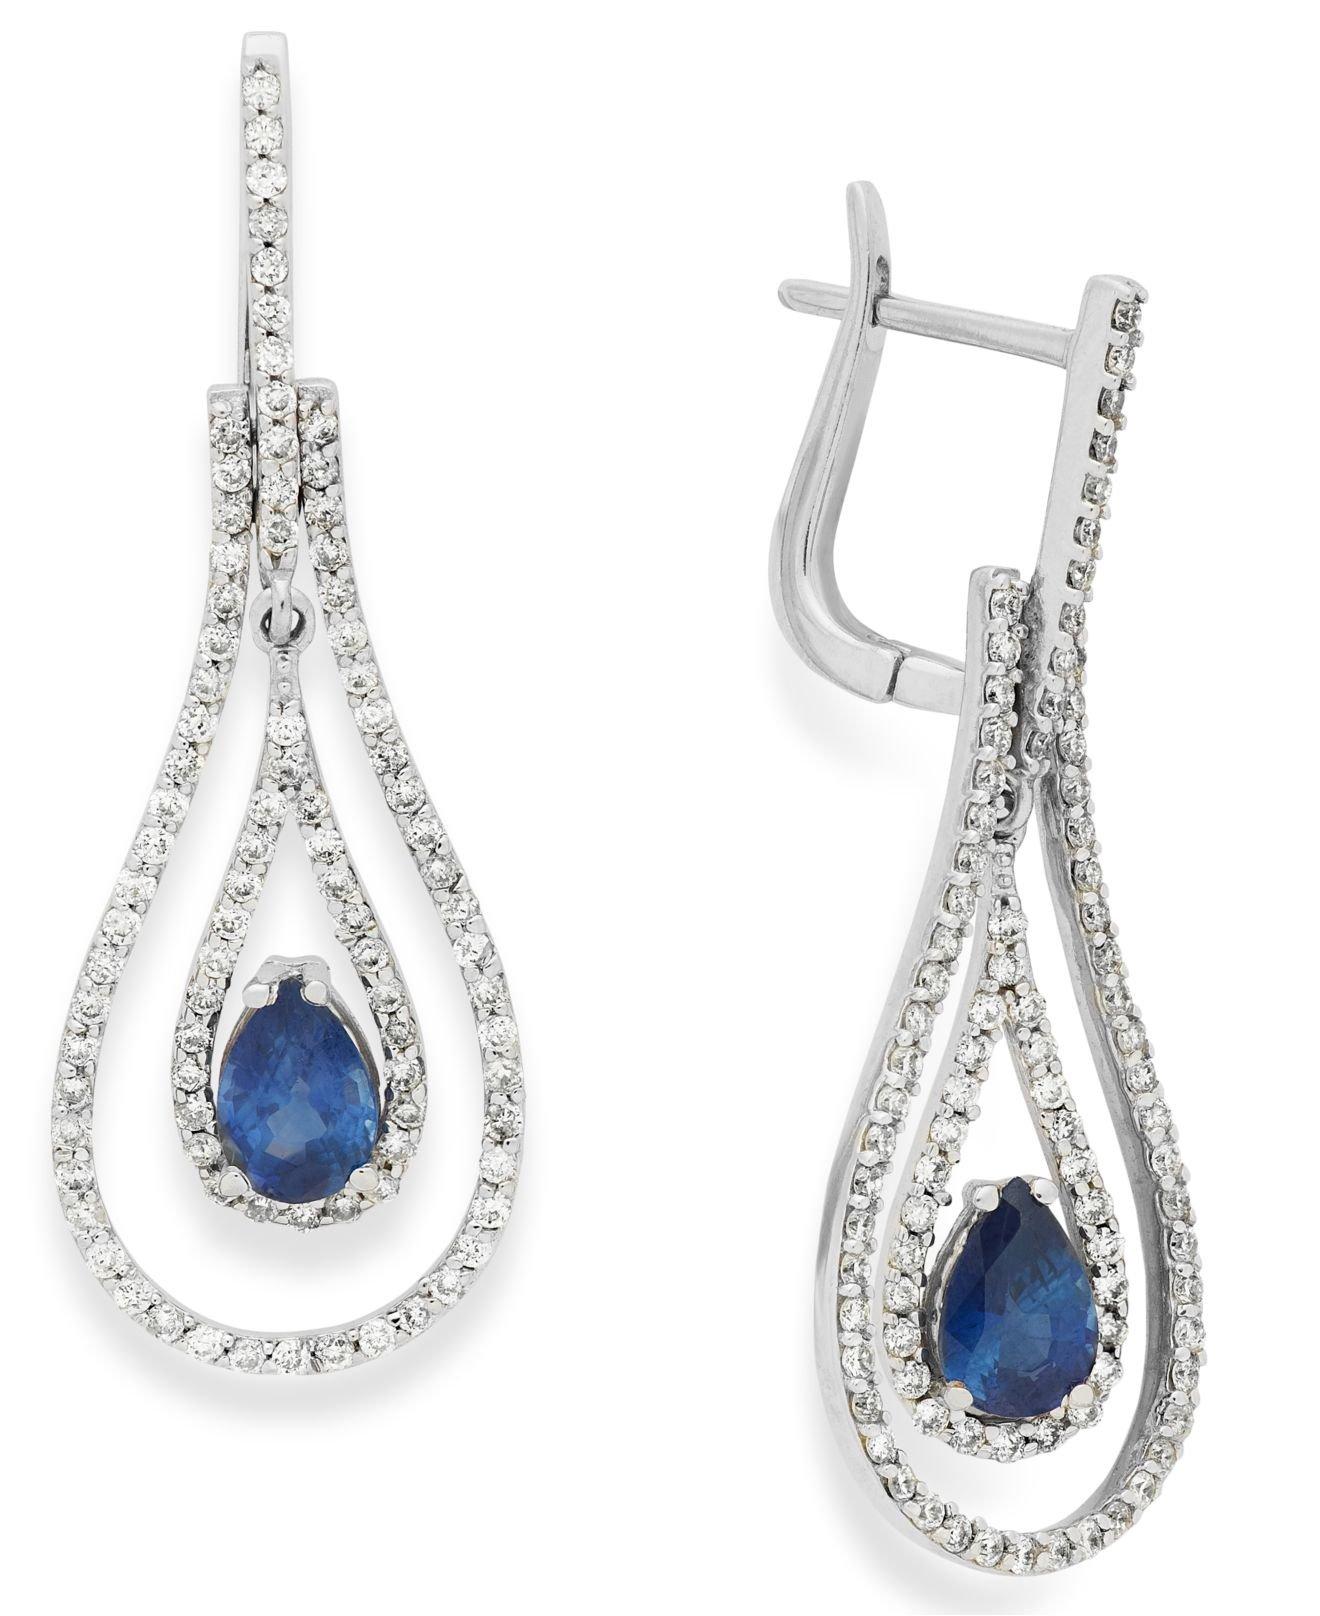 Sapphire Earrings Macys Collection